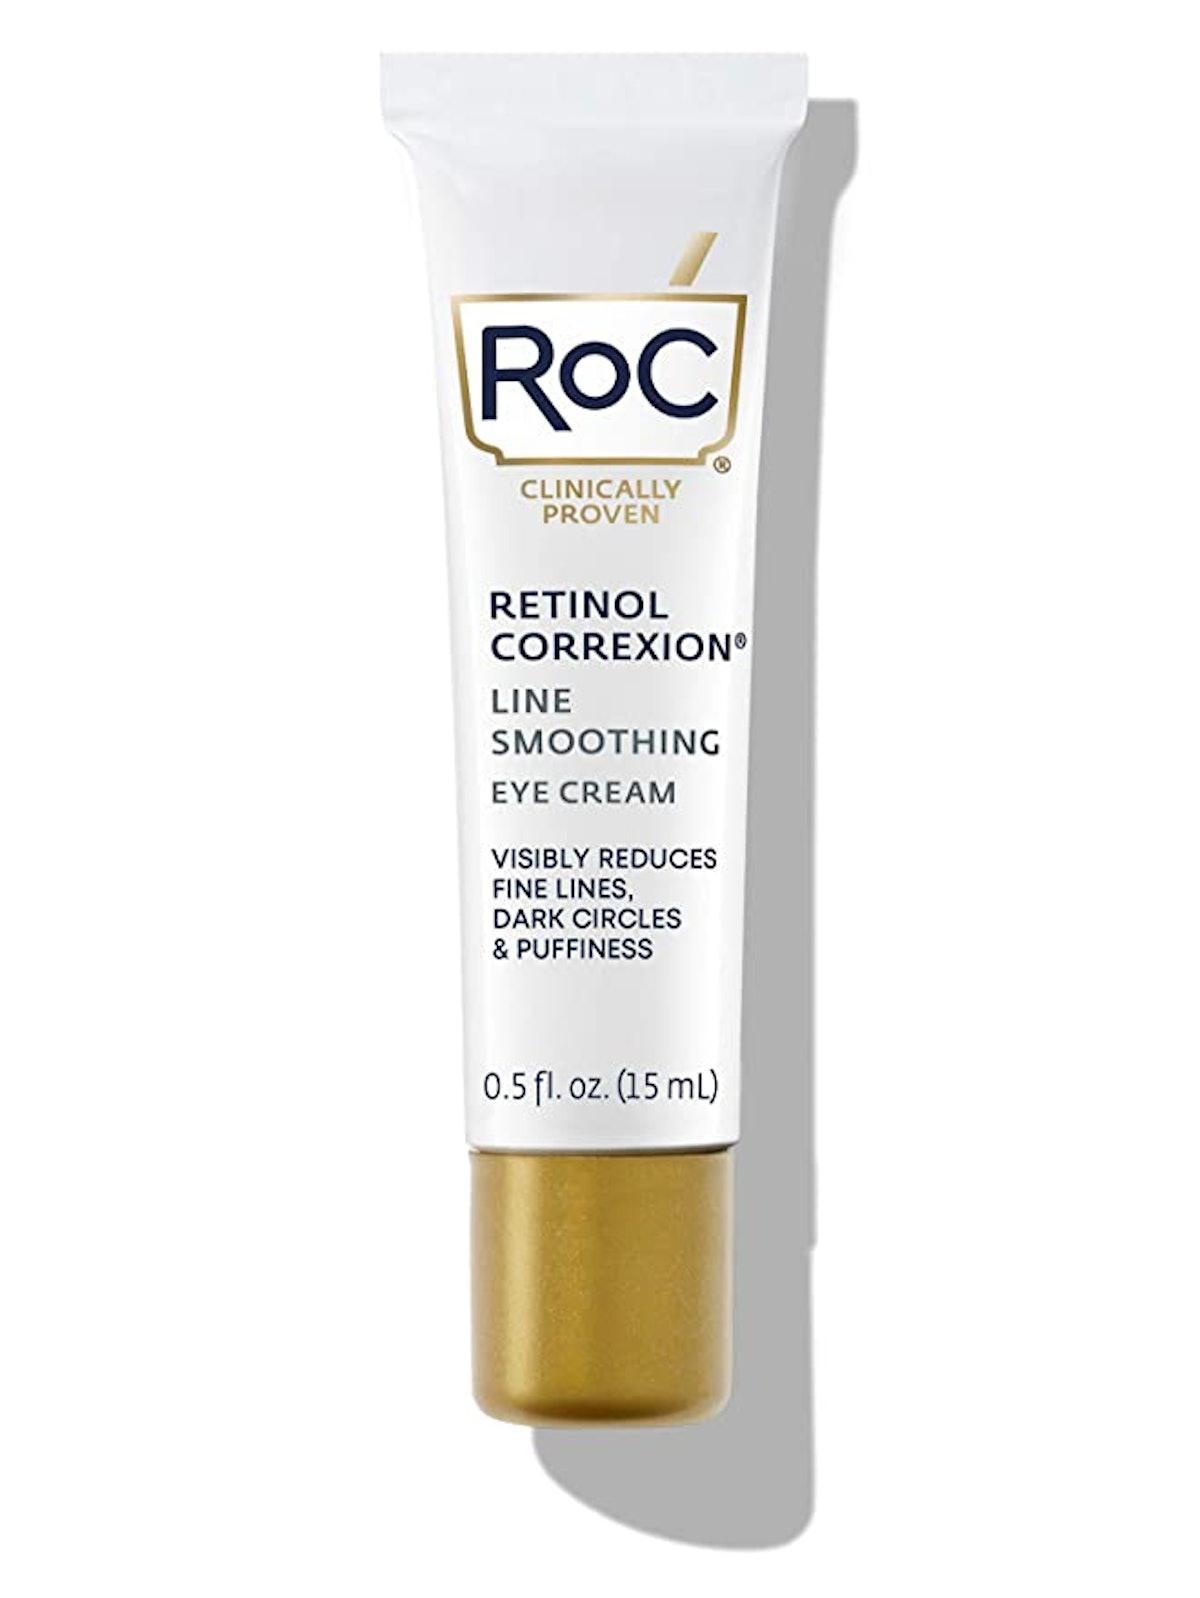 RoC Retinol Correxion Line Smoothing Eye Cream